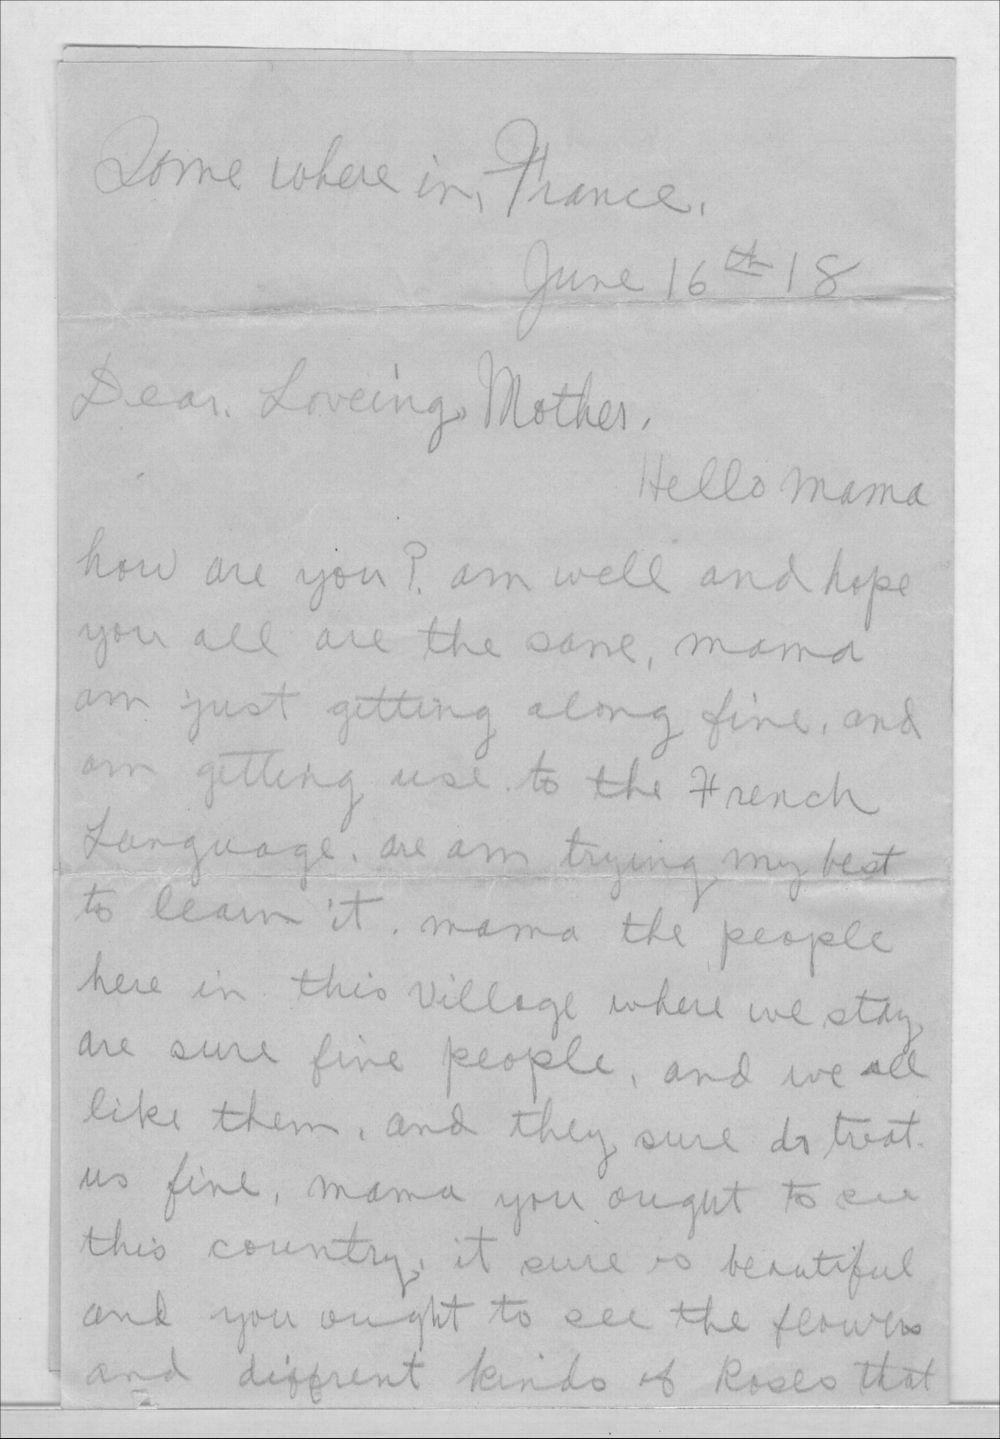 John A. Gersic to Mrs. Joseph Gersic - 1